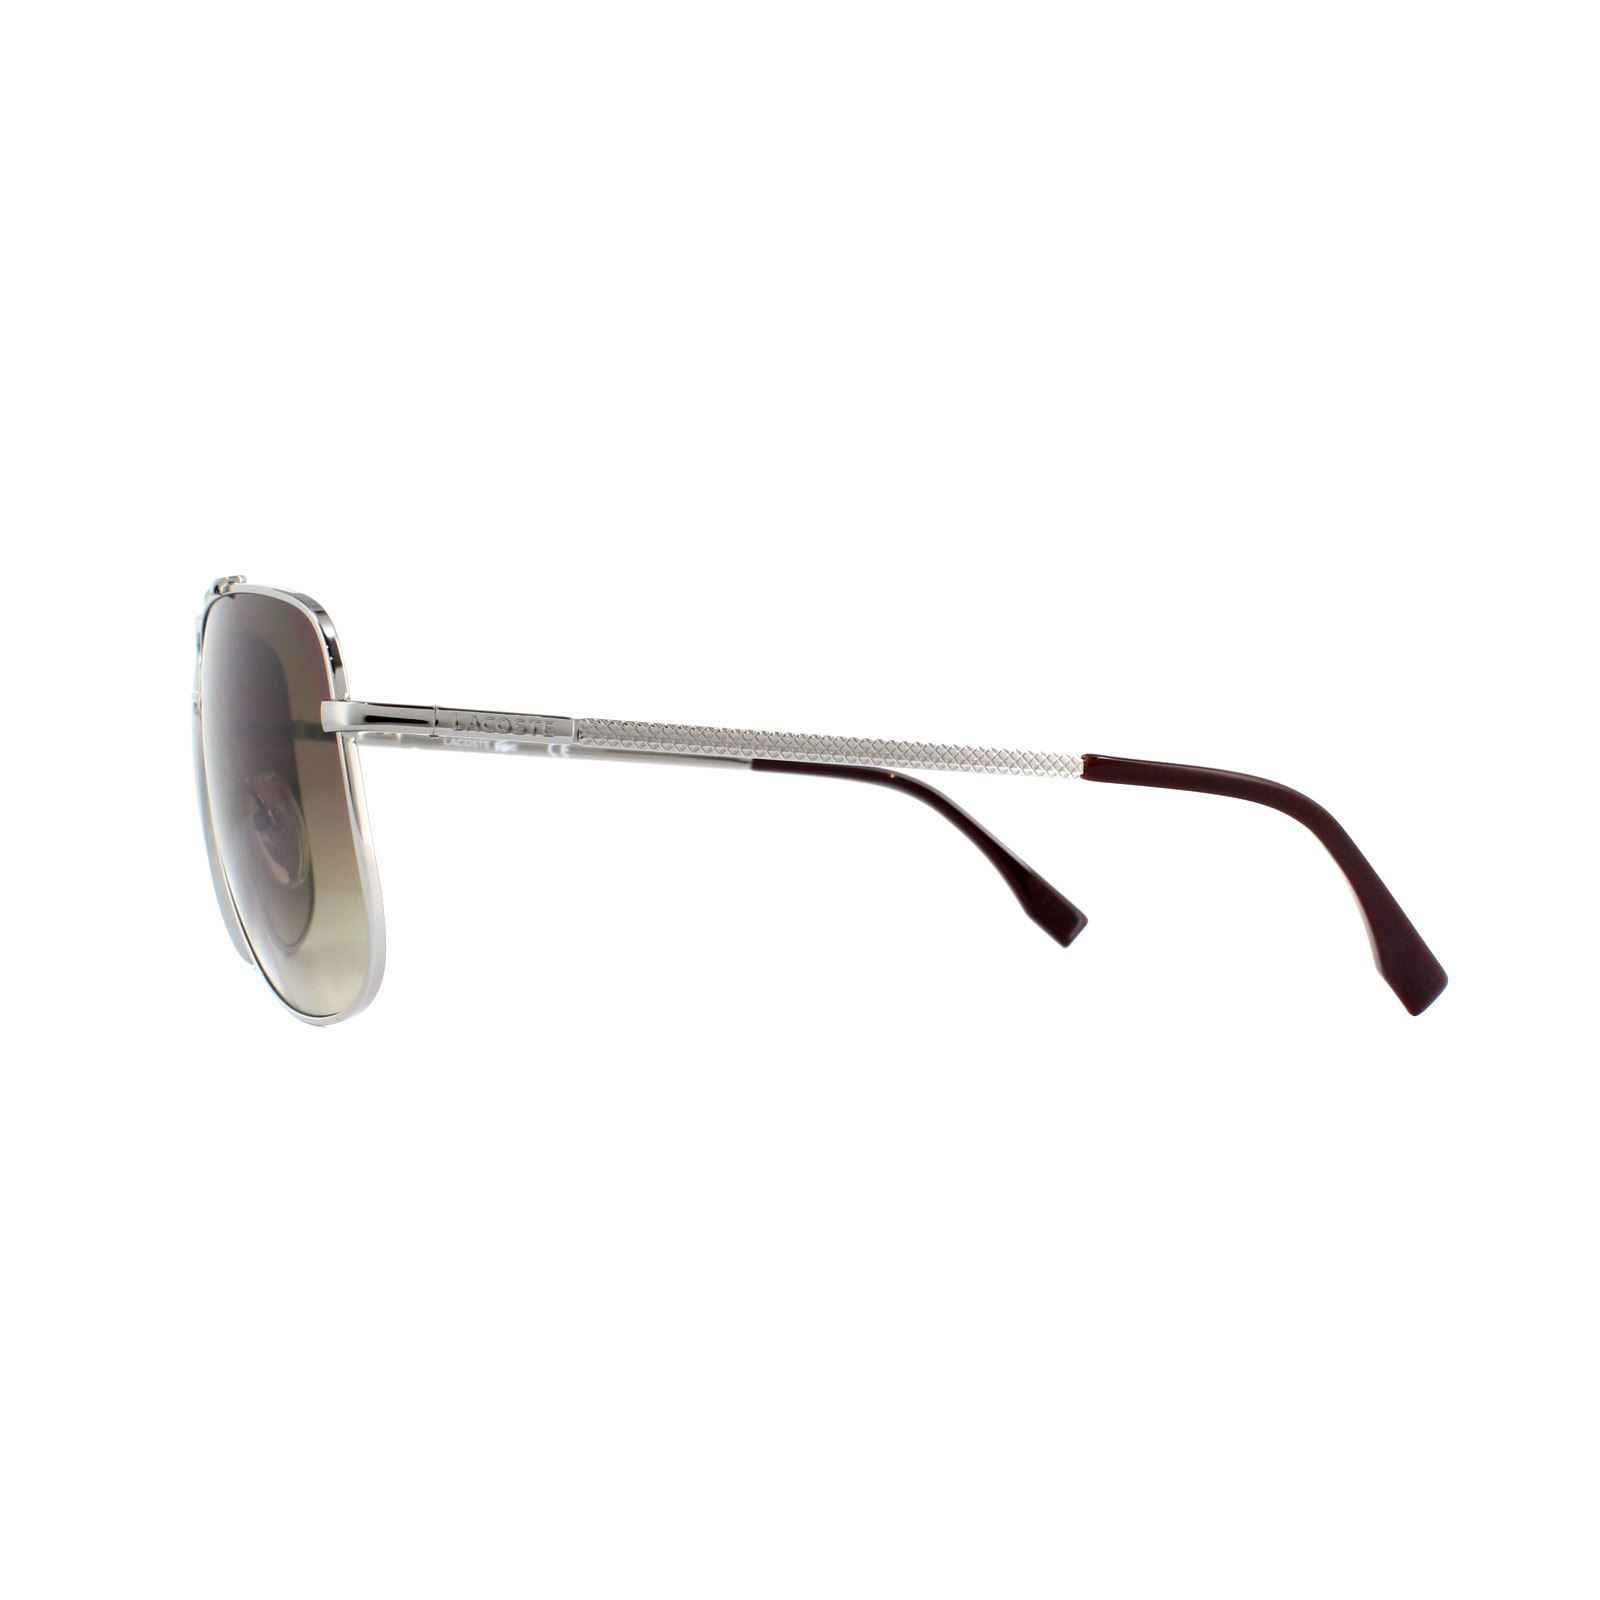 Lacoste Sunglasses L188S 035 Light Gunmetal Grey